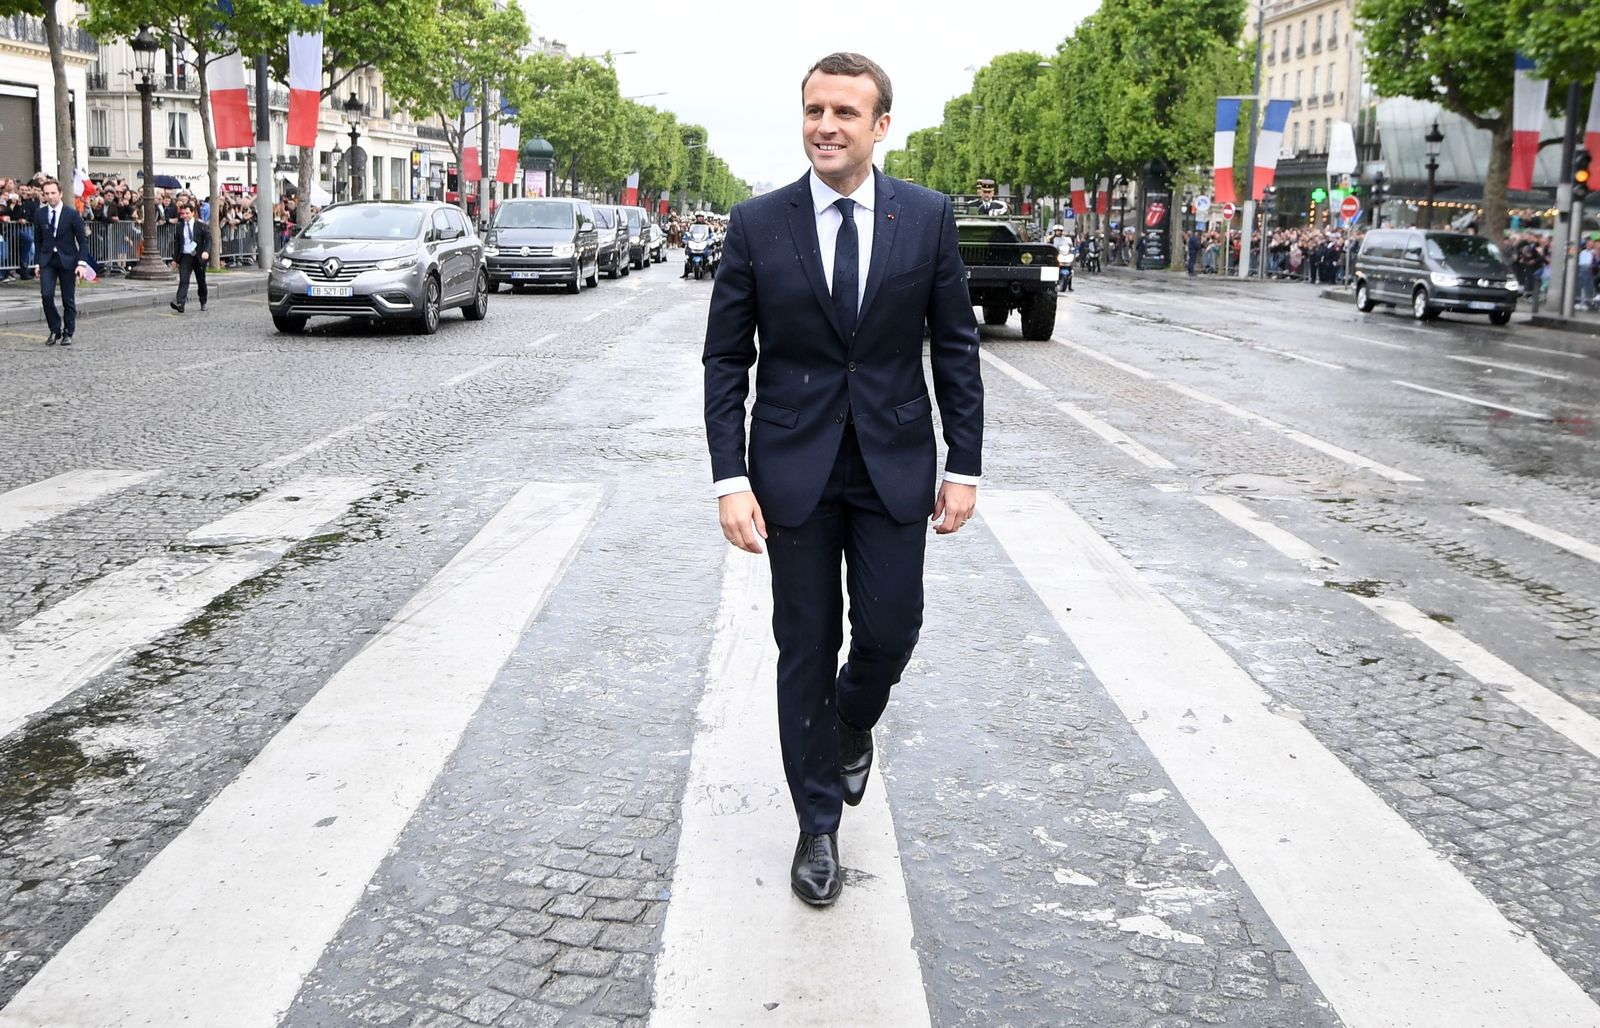 Paris / Emmanuel Macron / Amtseinführung